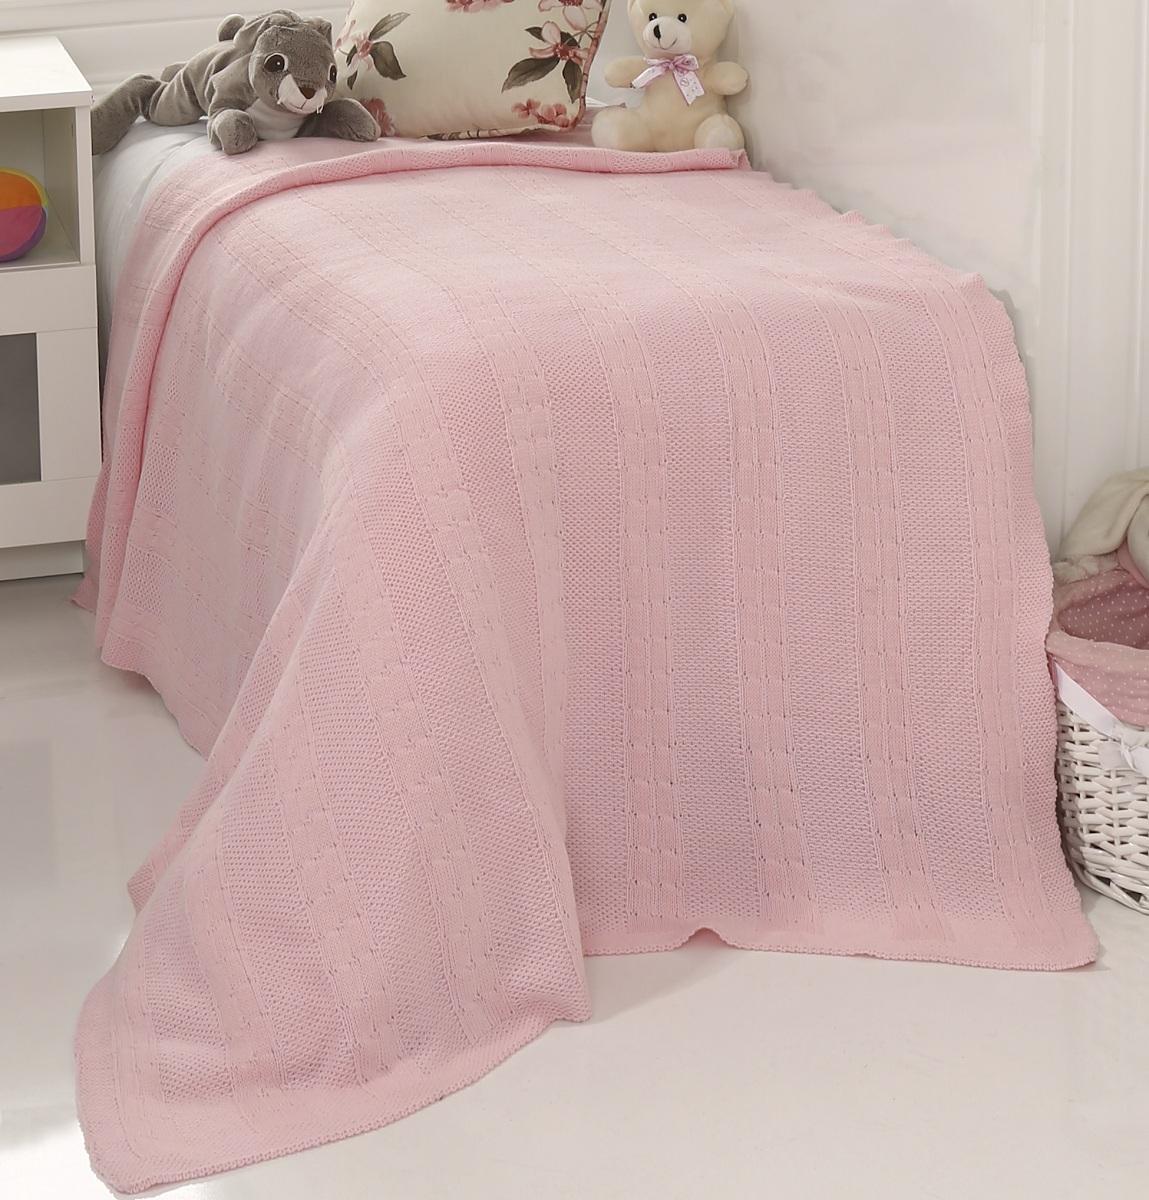 Детские покрывала, подушки, одеяла Karna